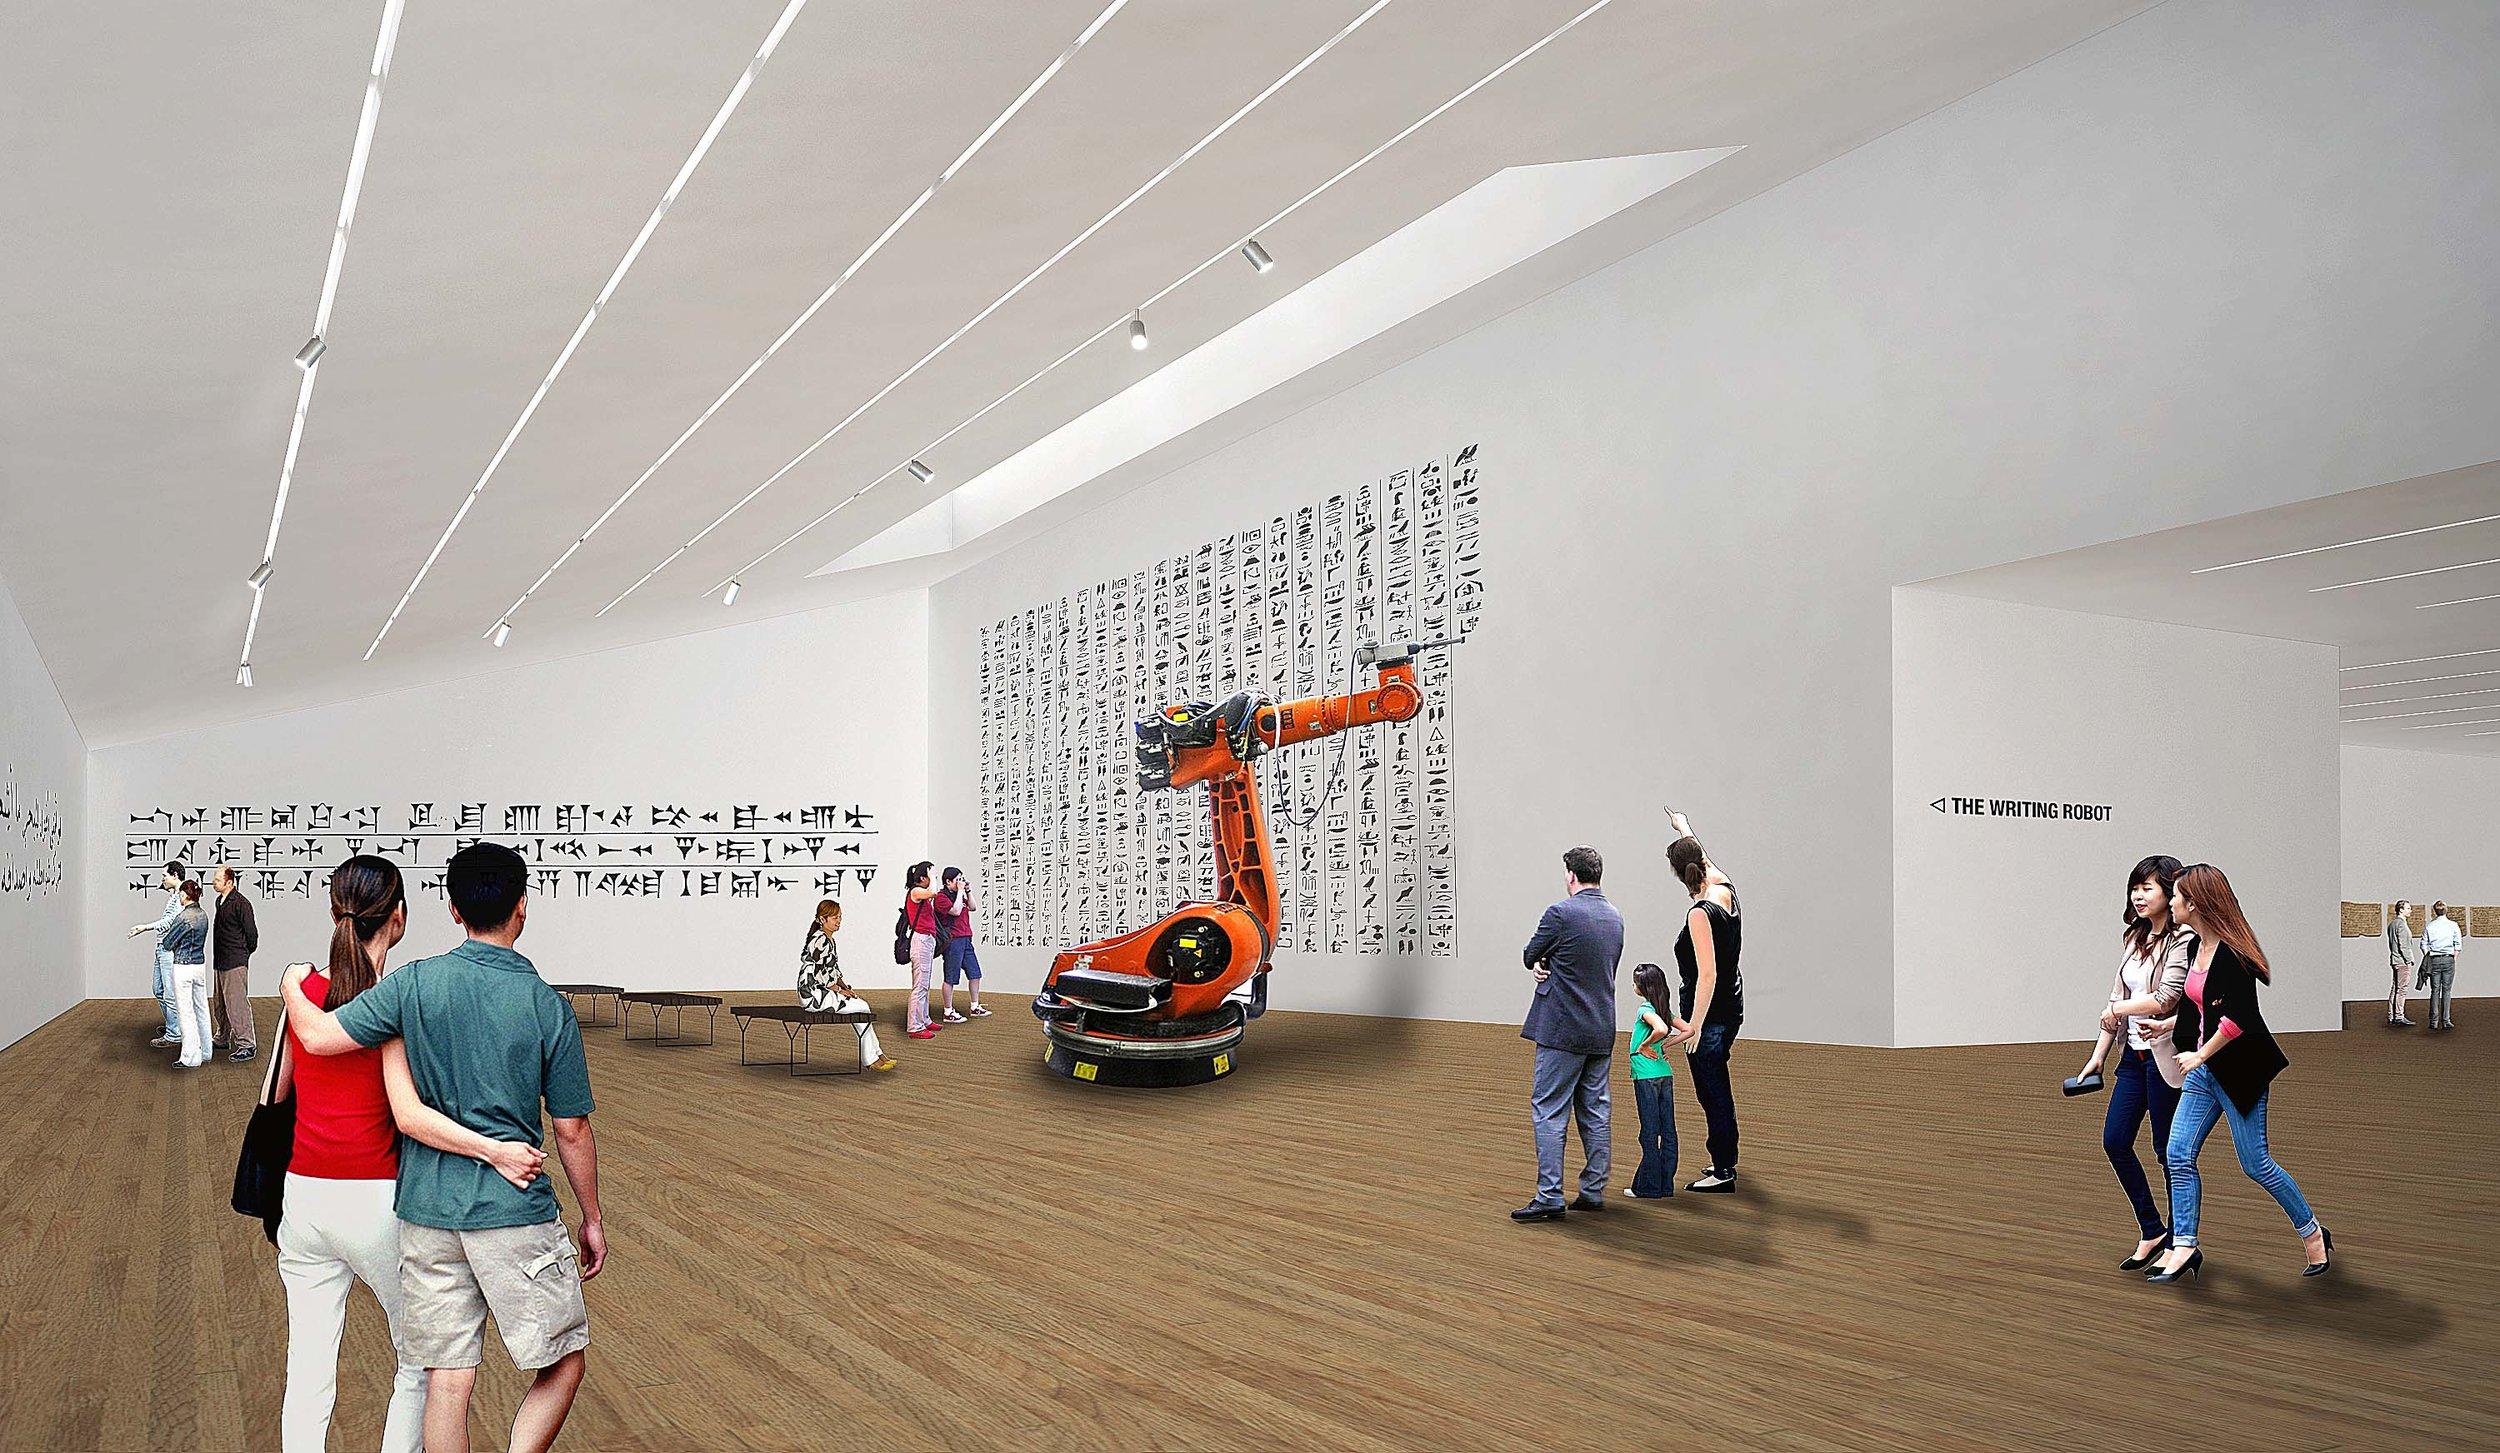 Permanent Exhibit  - 5-axis robot writing display